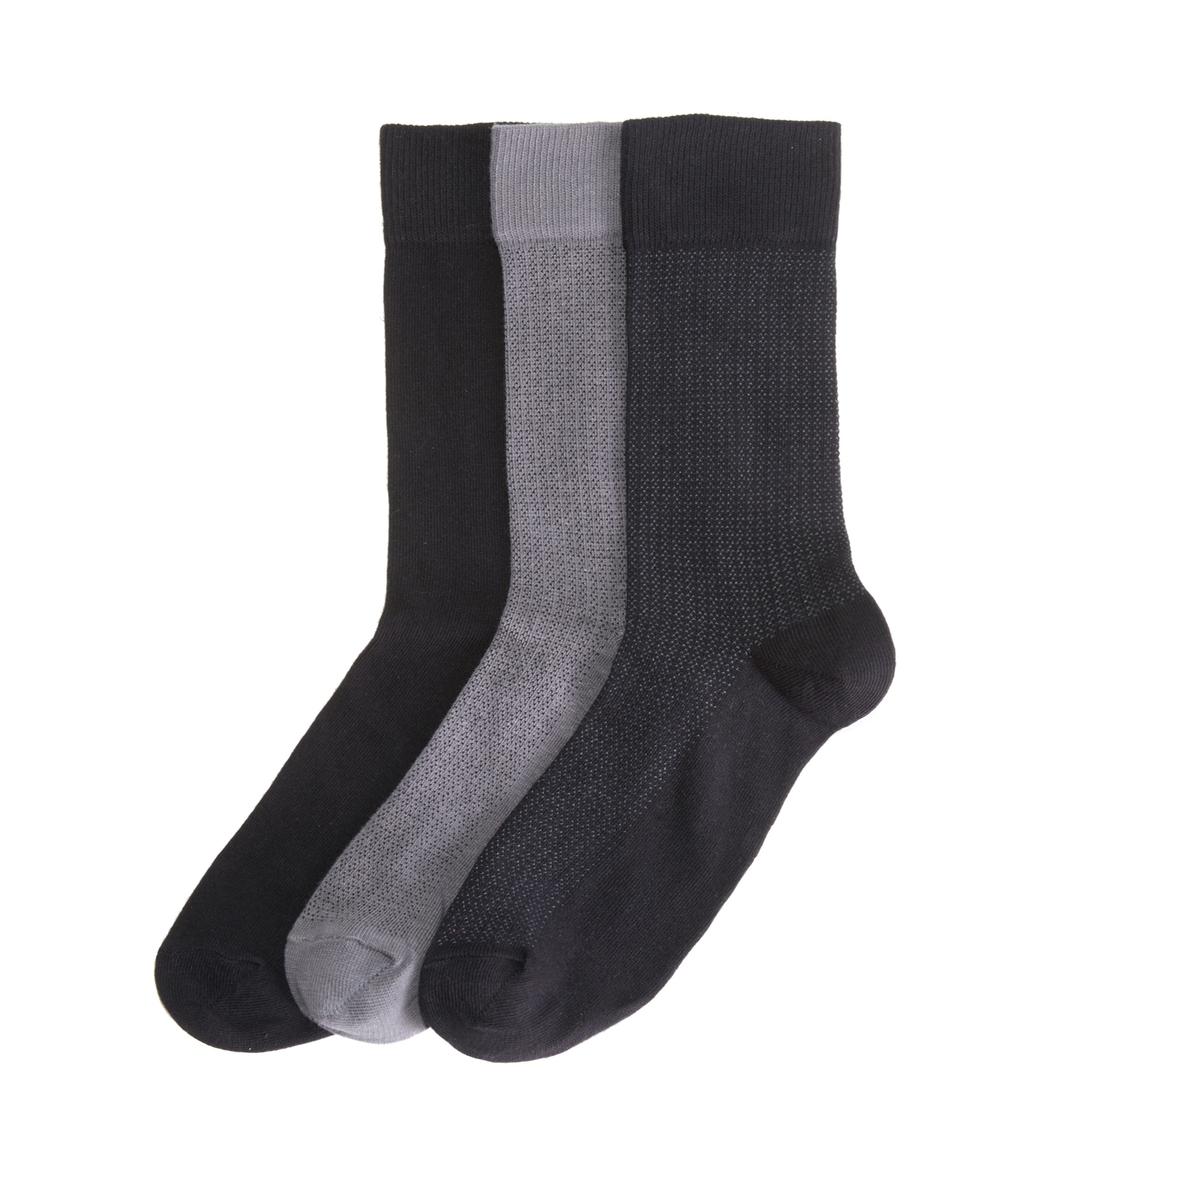 цена на Комплект из 3 пар носков La Redoute La Redoute 39/42 черный